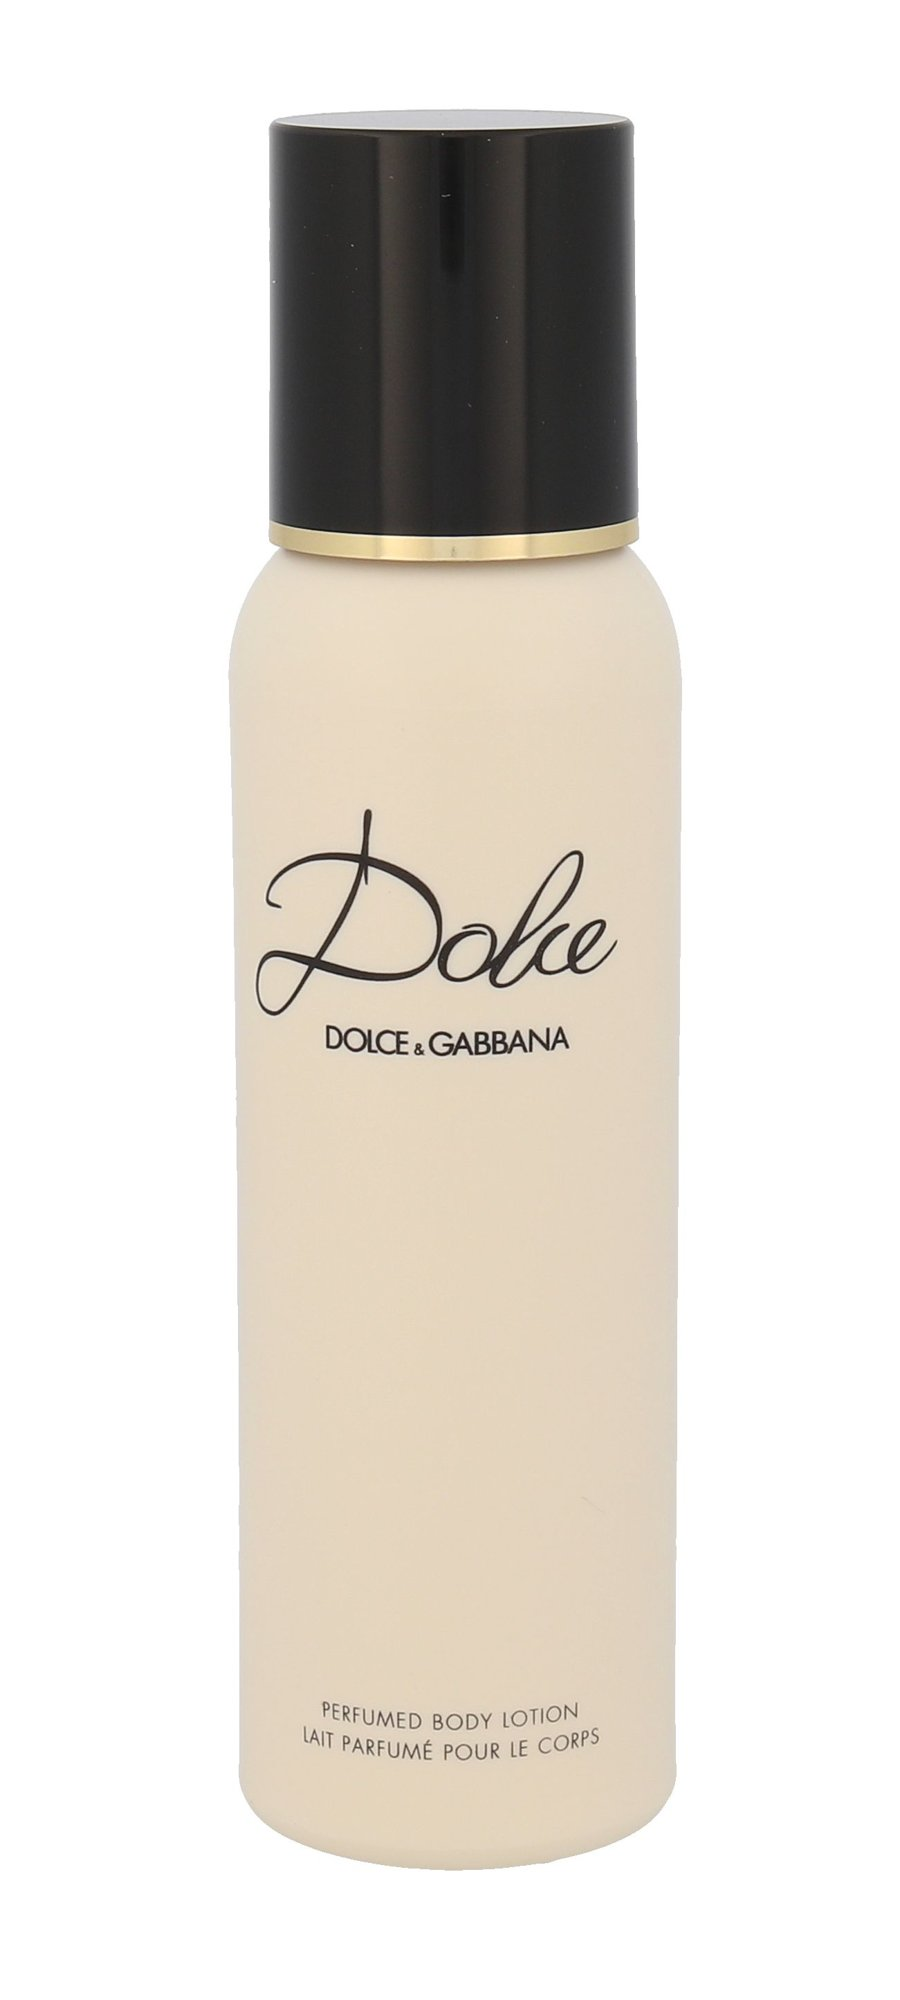 Dolce&Gabbana Dolce Body lotion 100ml